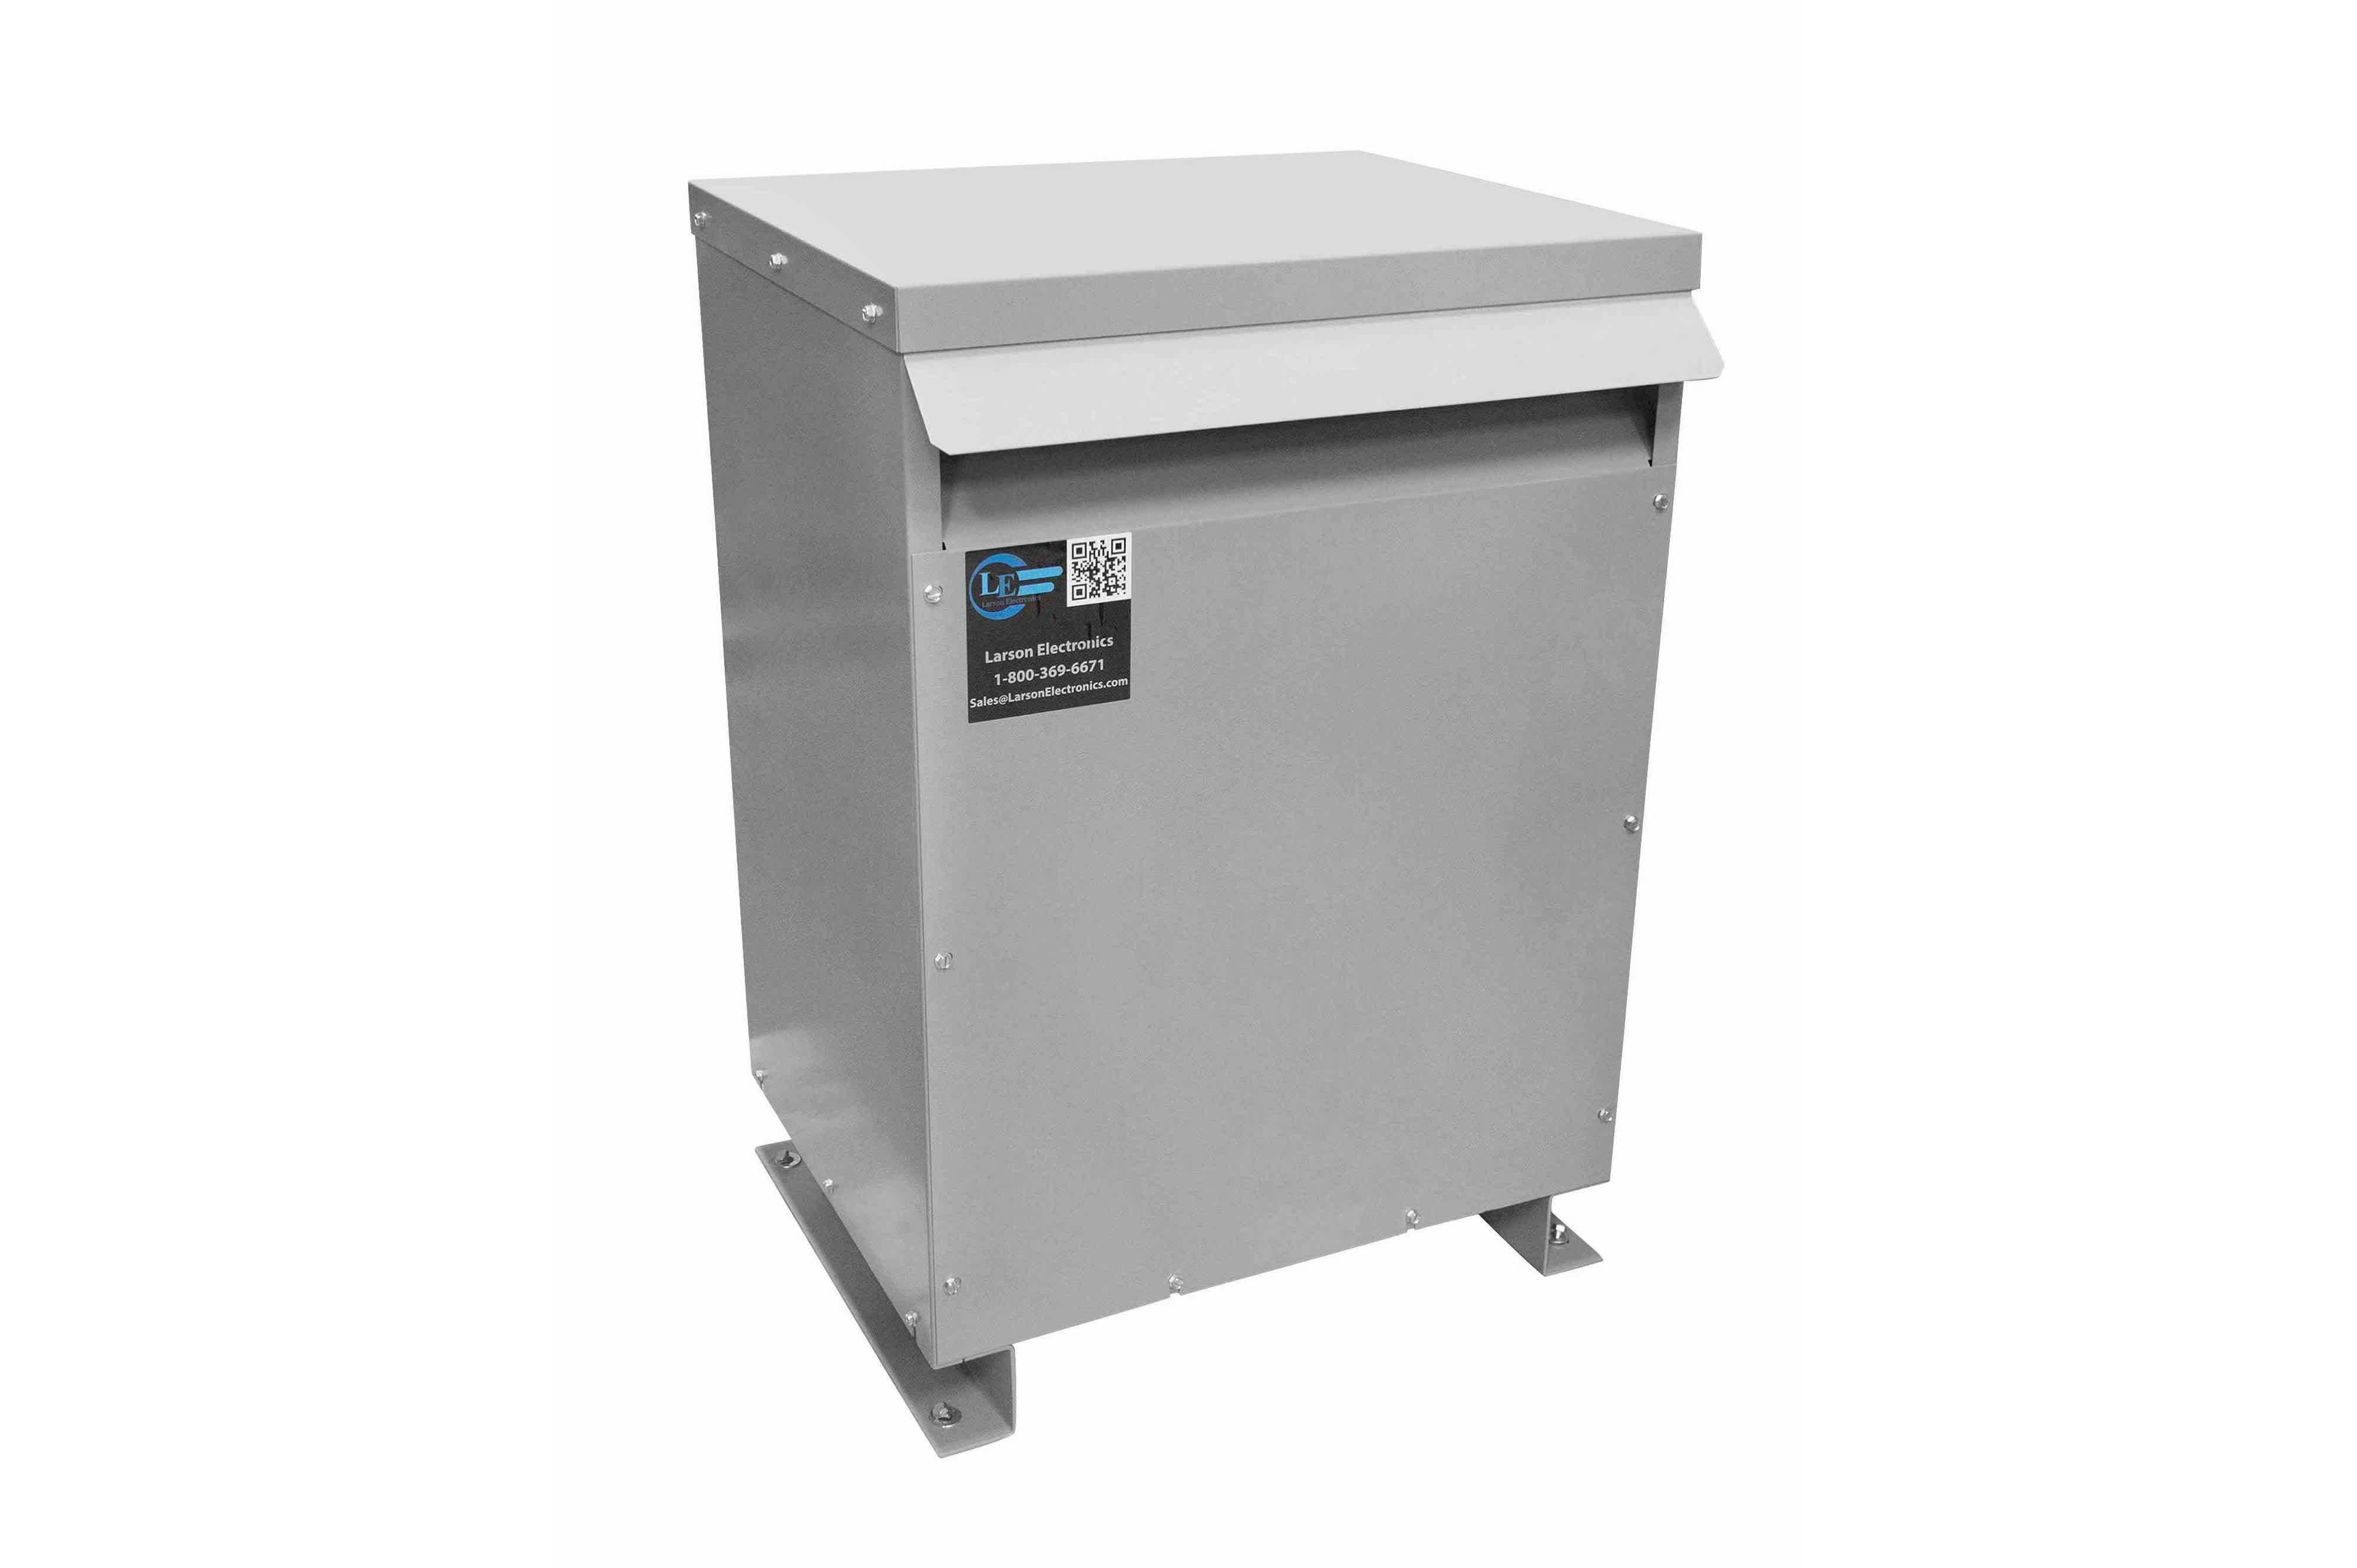 400 kVA 3PH Isolation Transformer, 380V Wye Primary, 480V Delta Secondary, N3R, Ventilated, 60 Hz